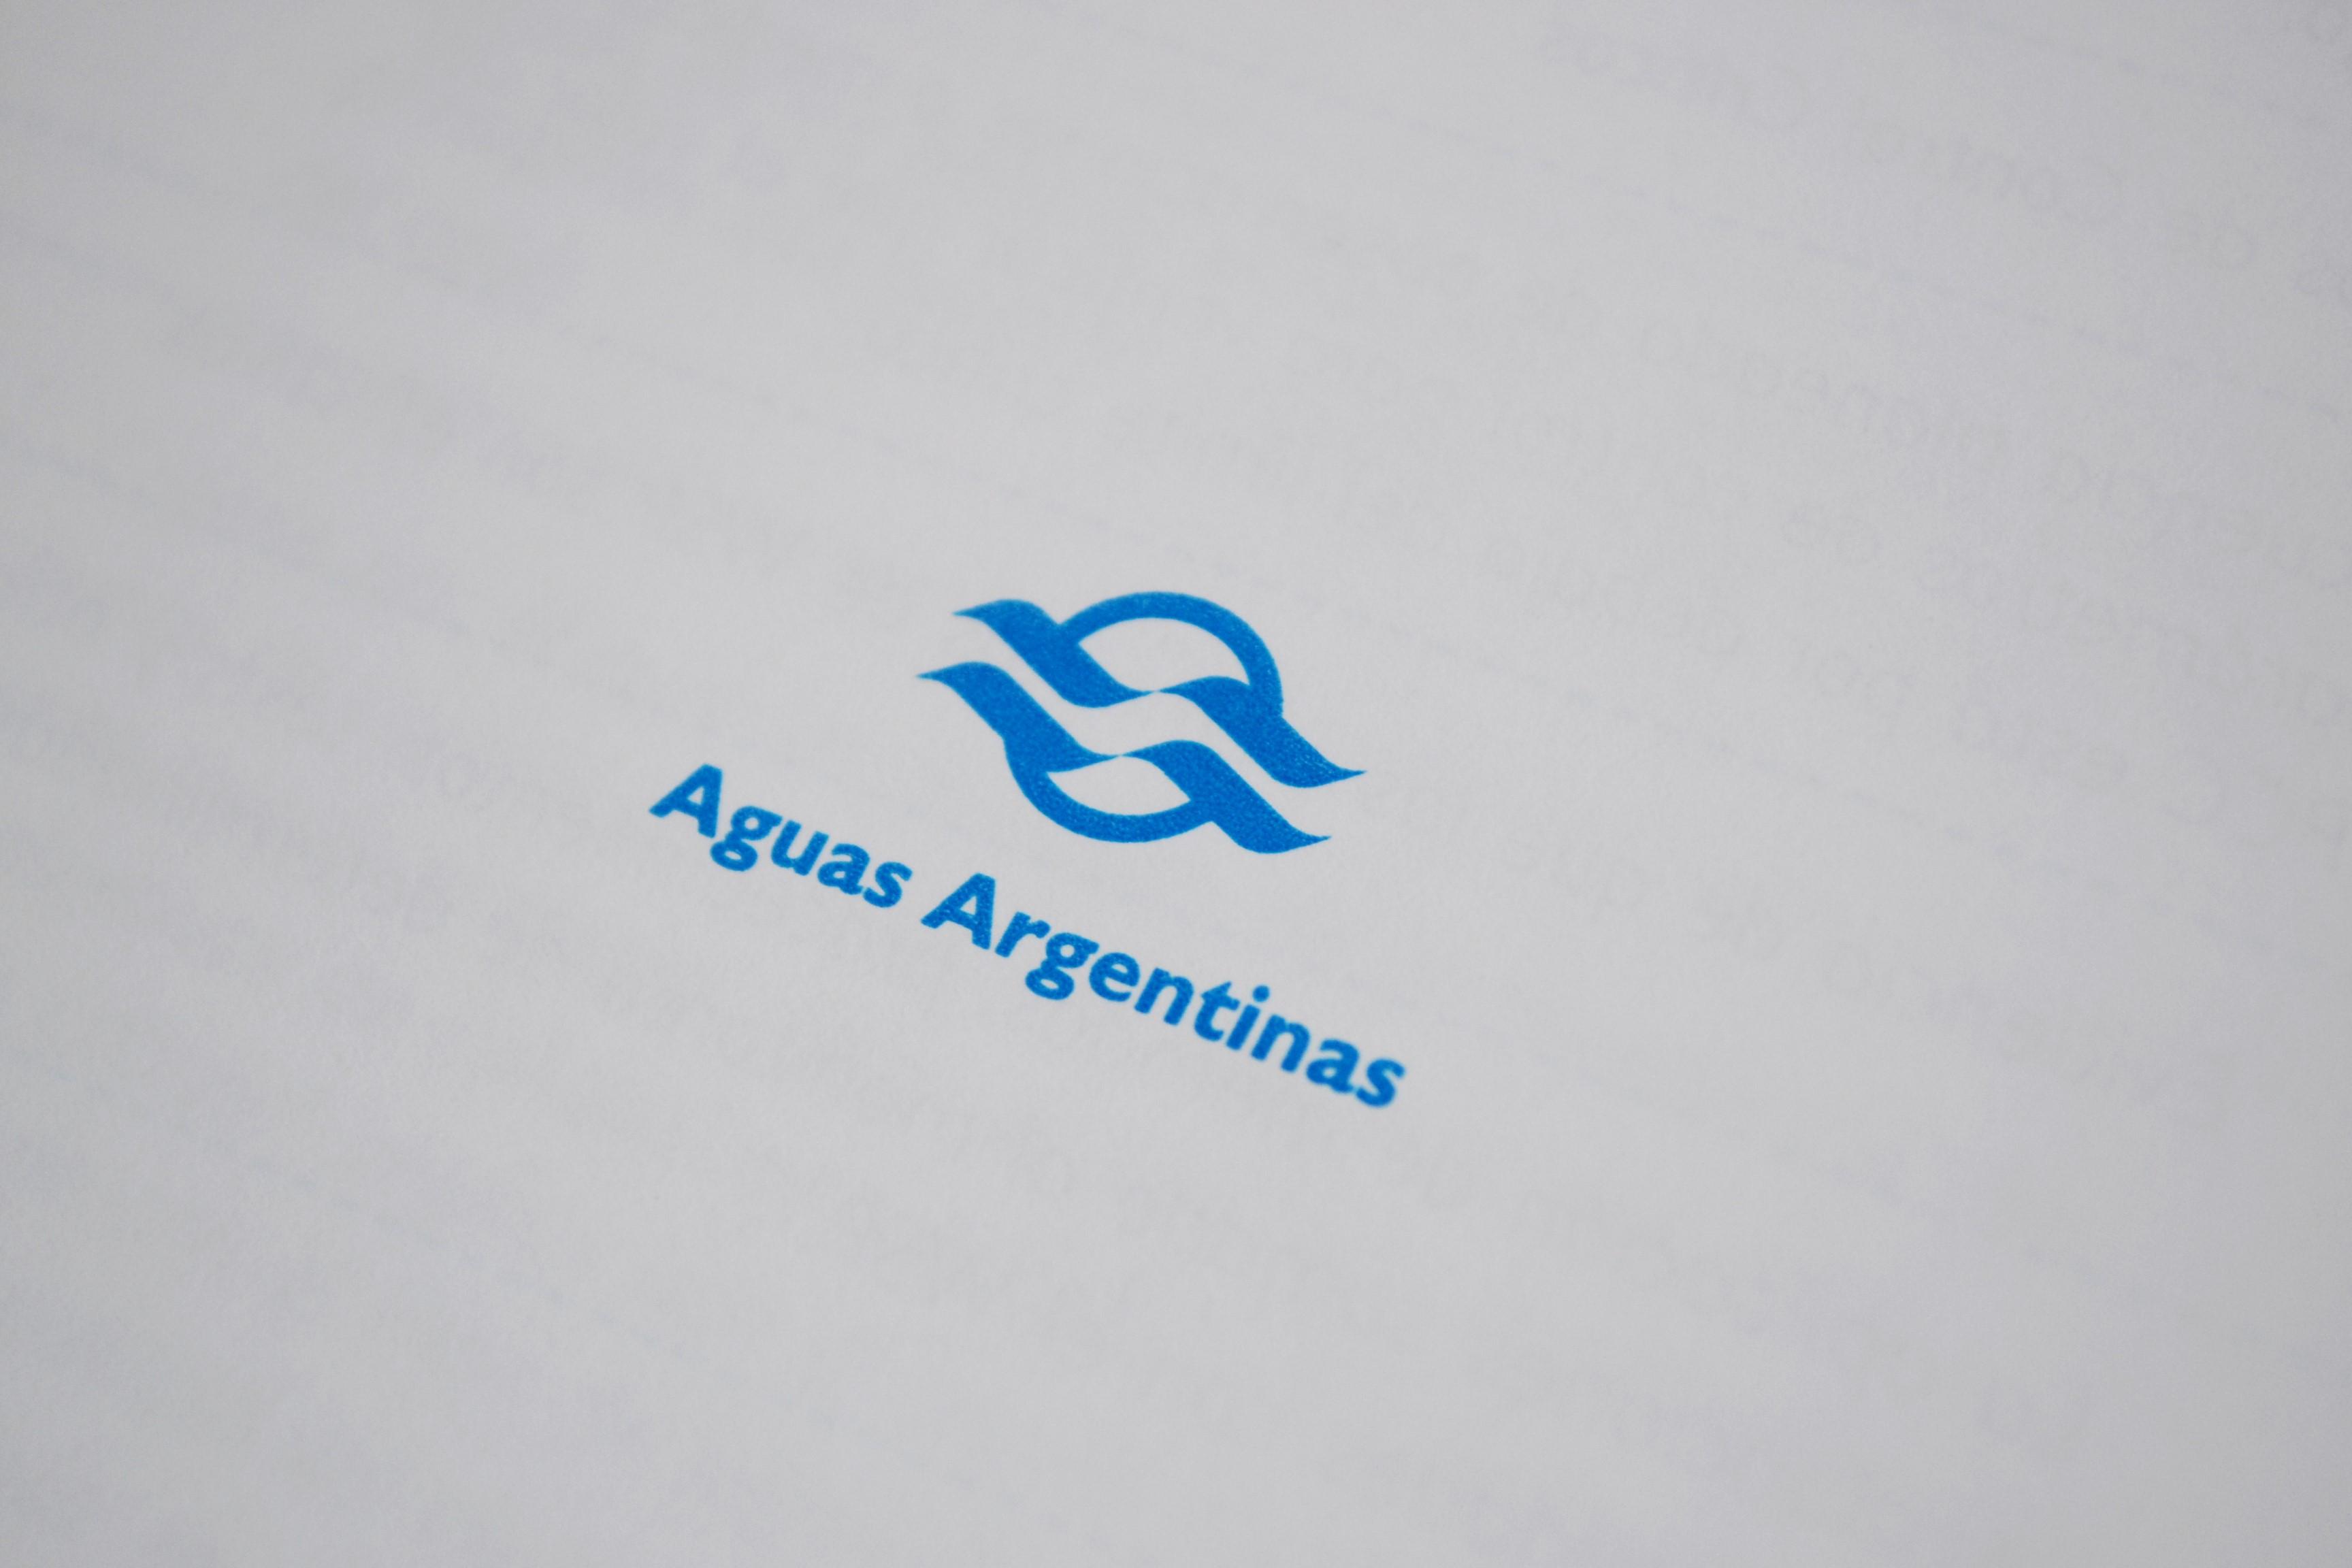 AguasArgentinas_7